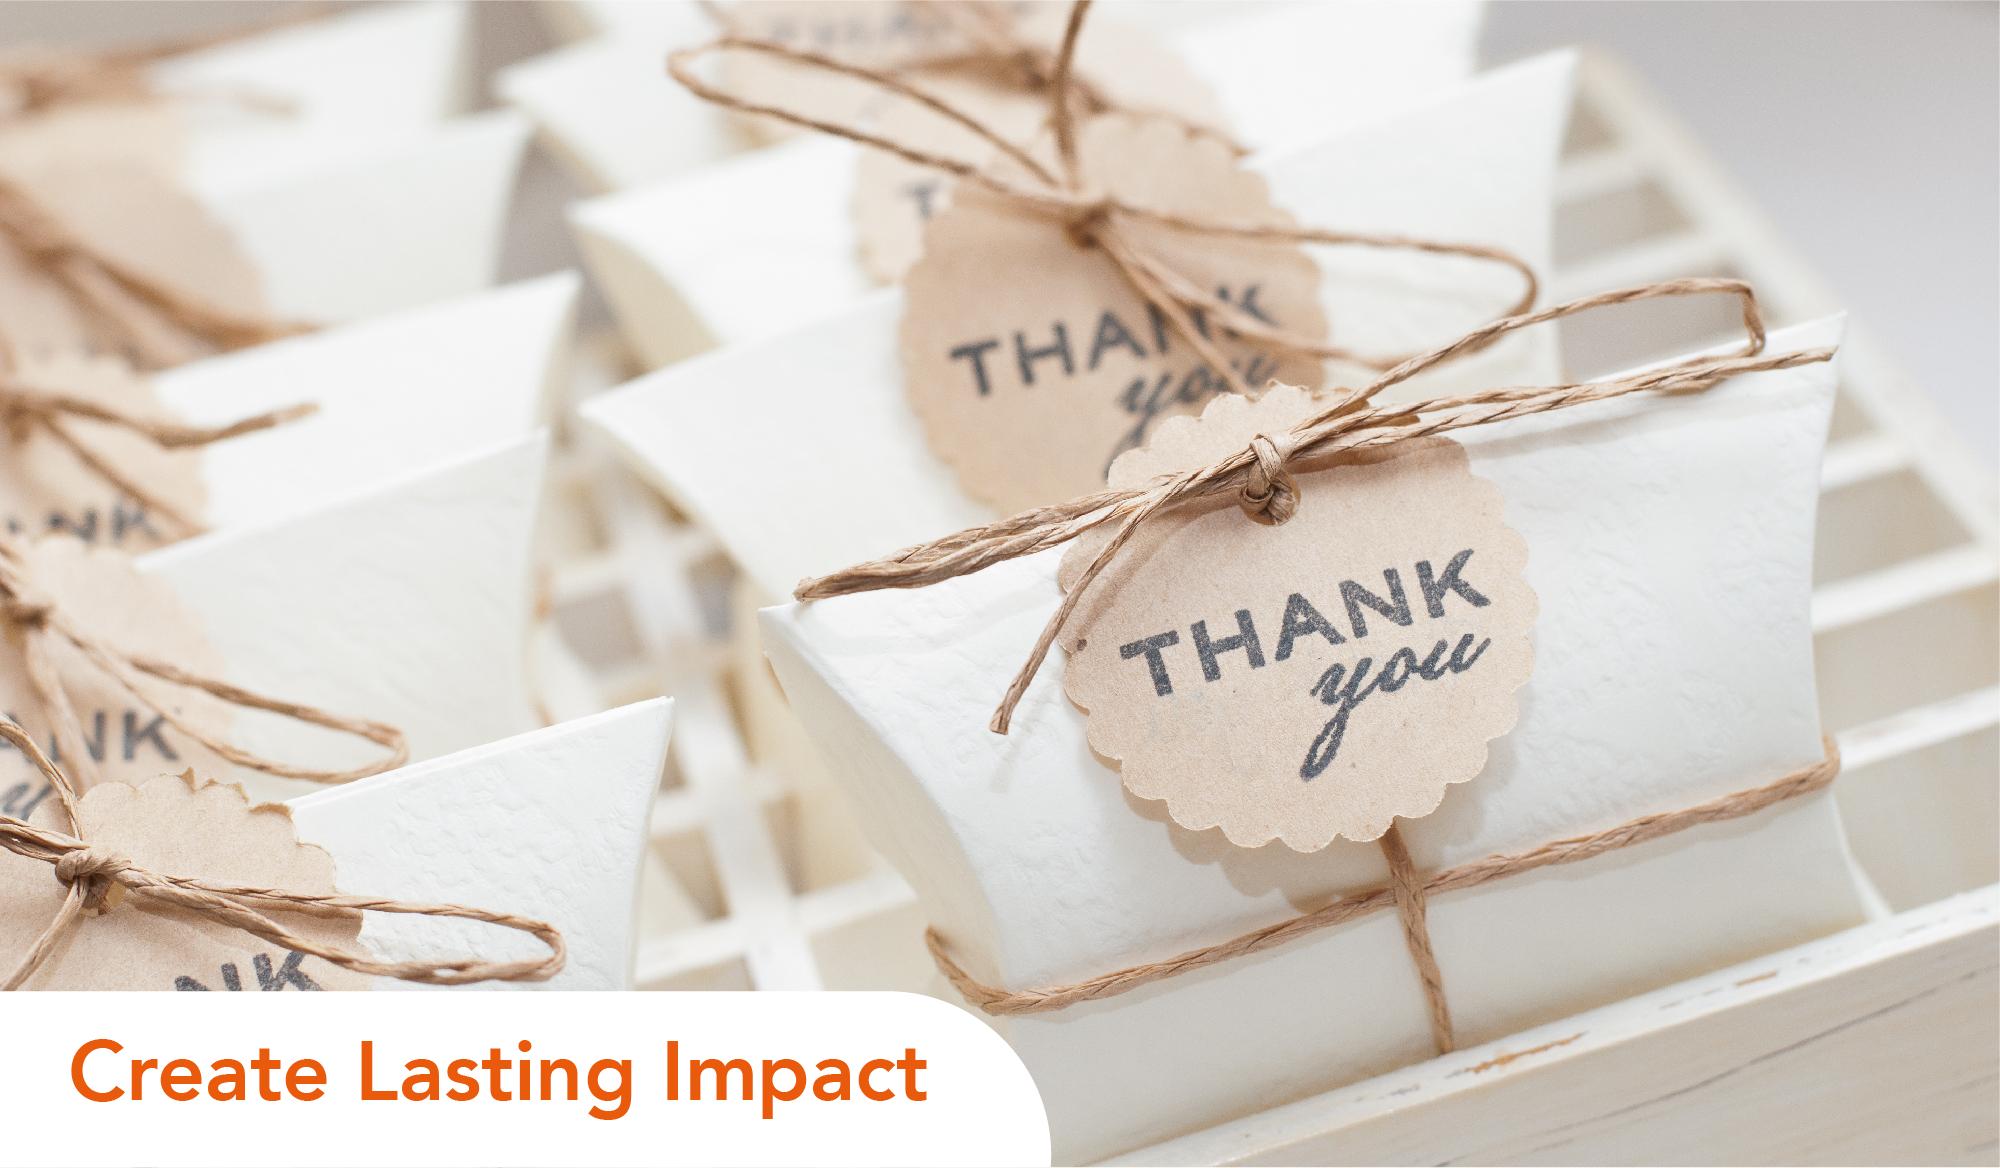 Create Lasting Impact